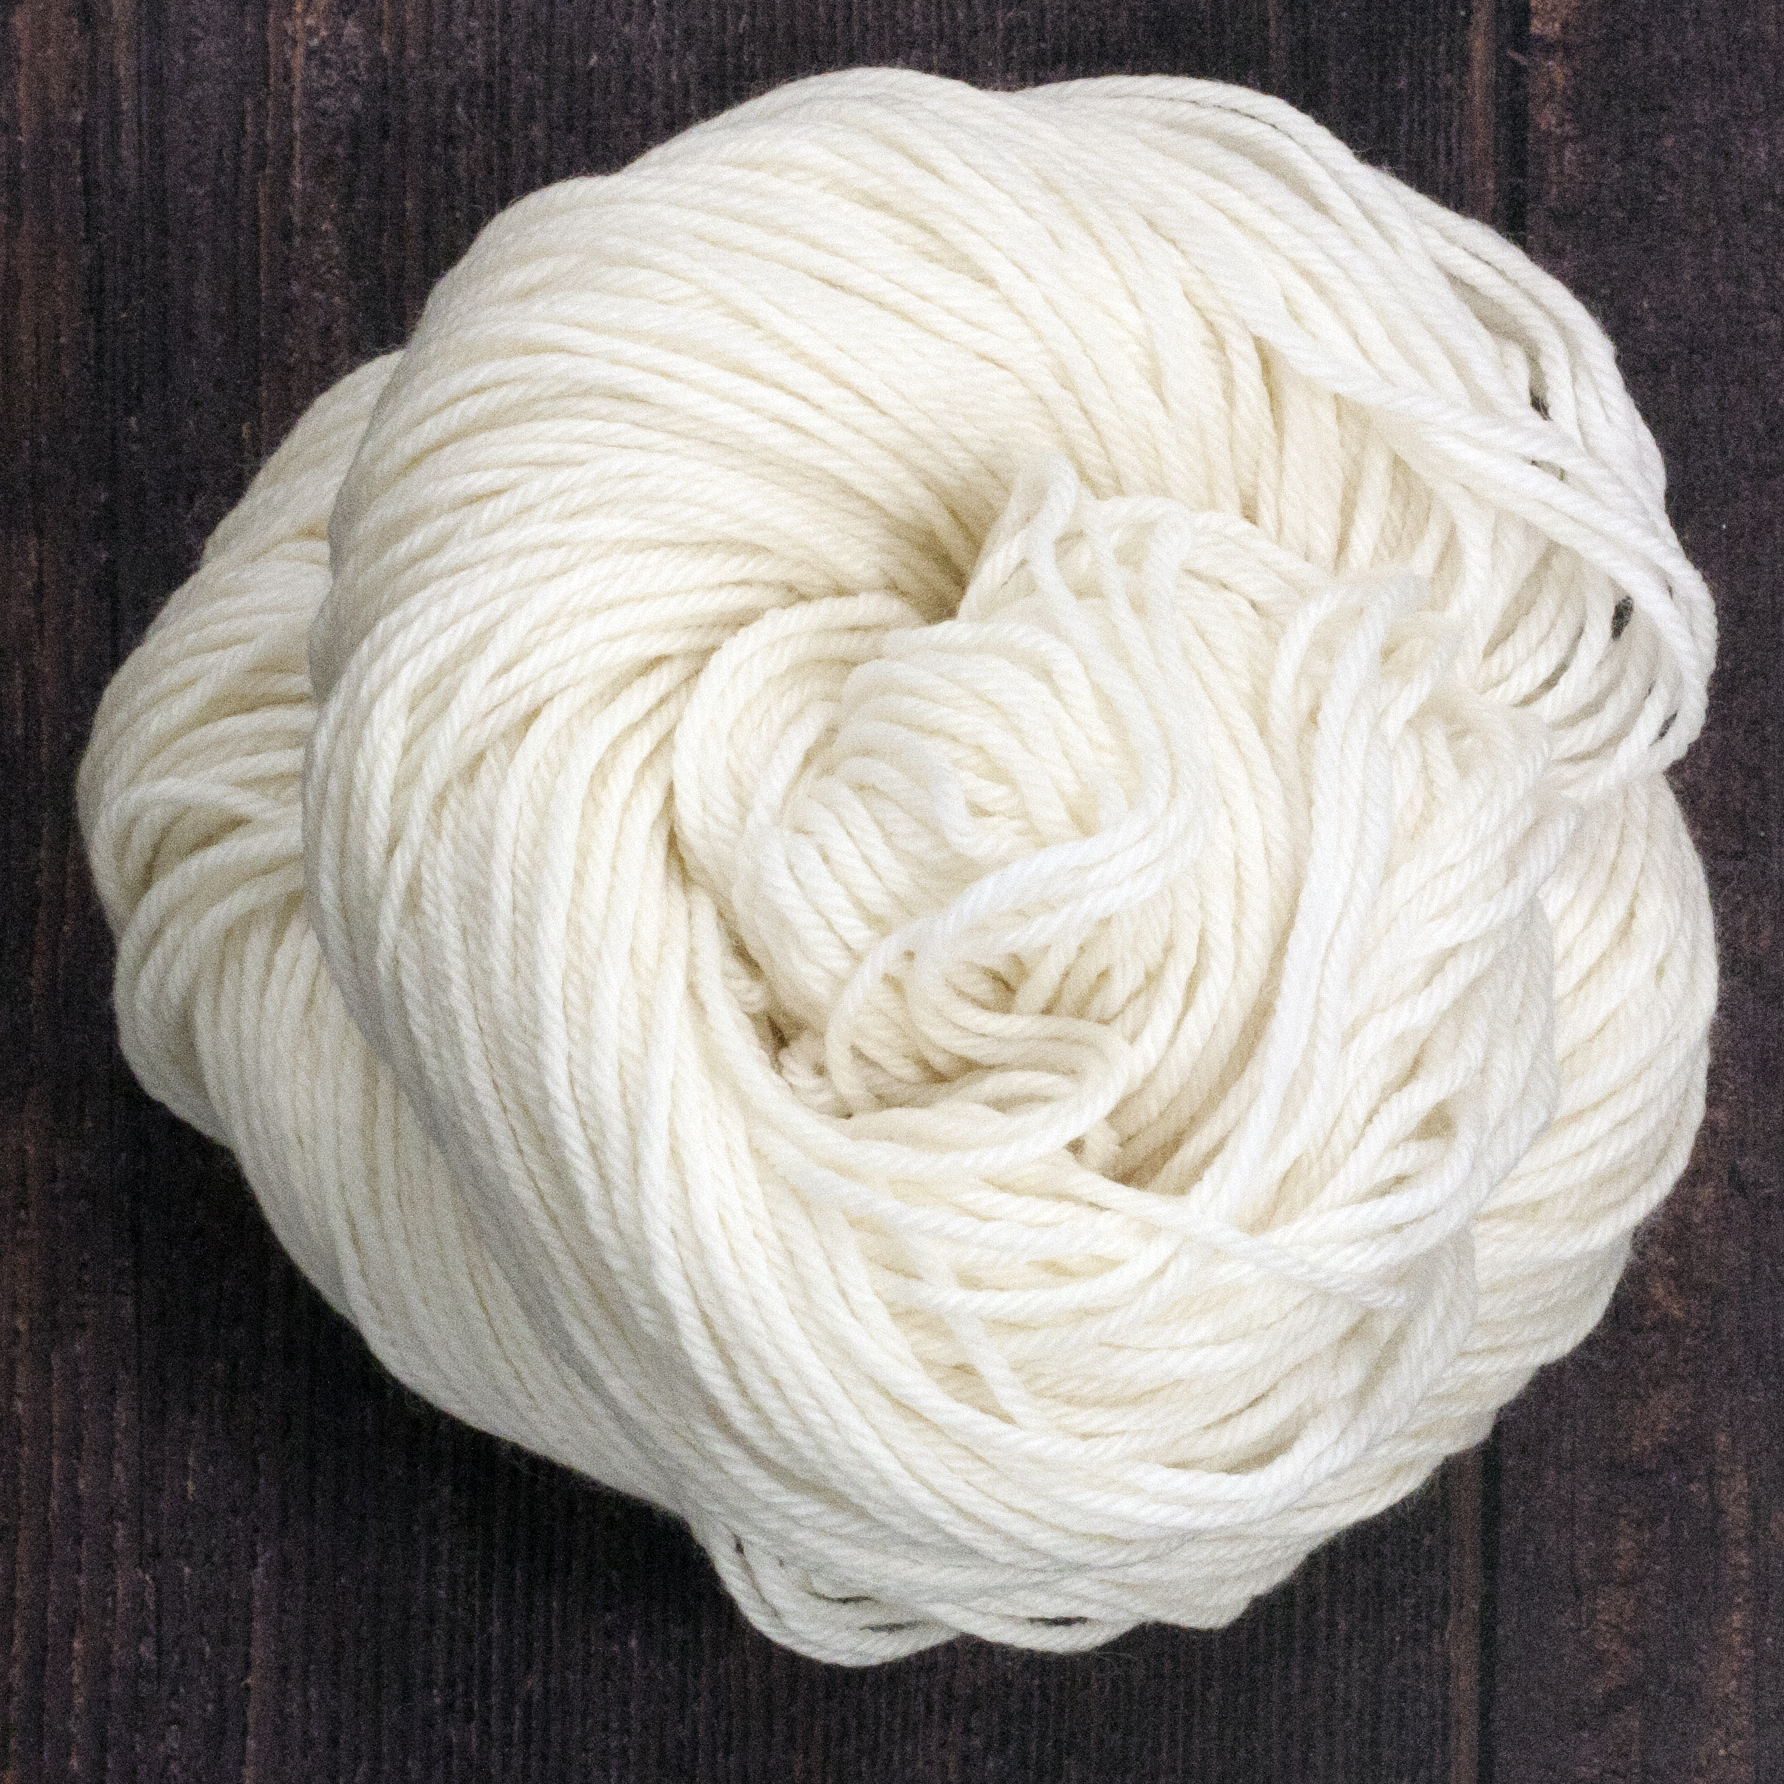 Type 49152   SW Sport 262  100% Superwash Merino Wool  100g Hanks  262m per 100g 4/10.5nm